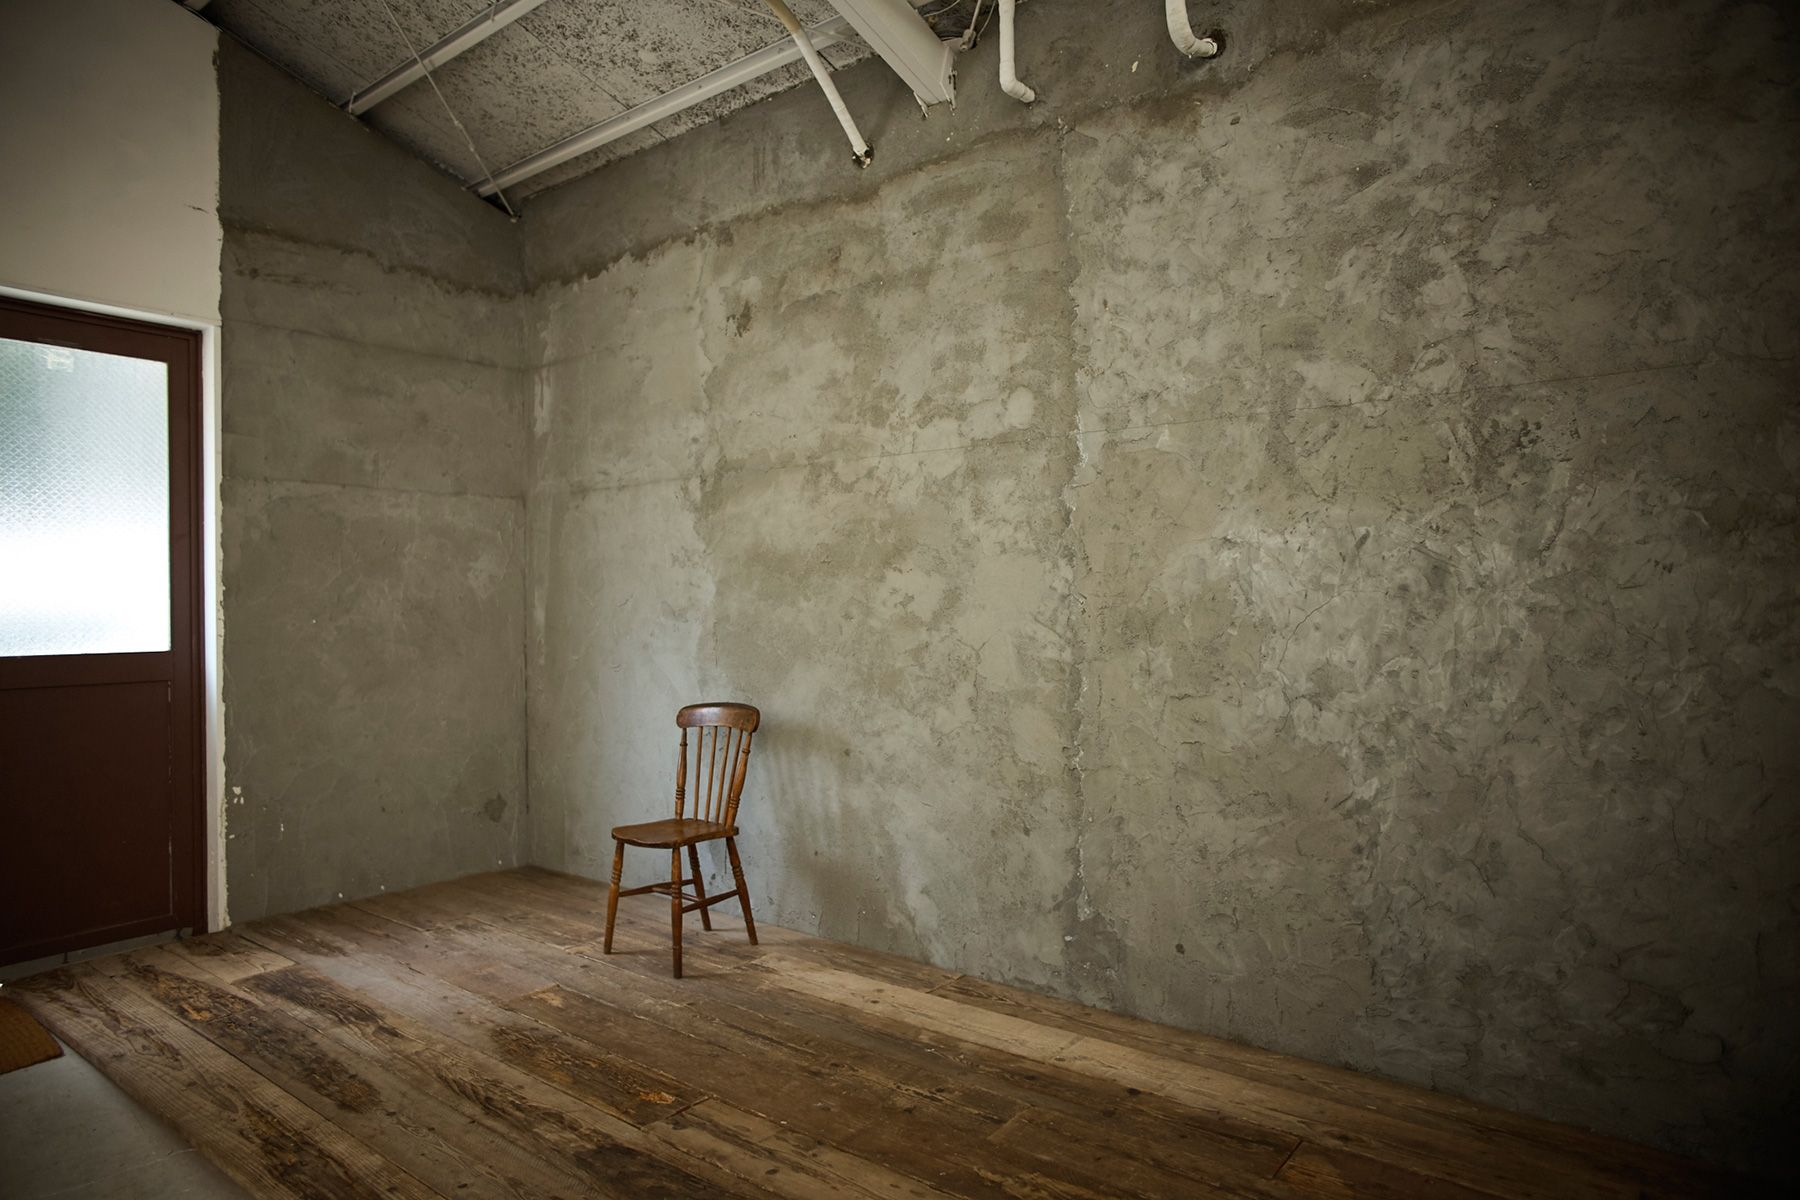 STUDIO MAU(スタジオ マウ)モルタルの荒い壁